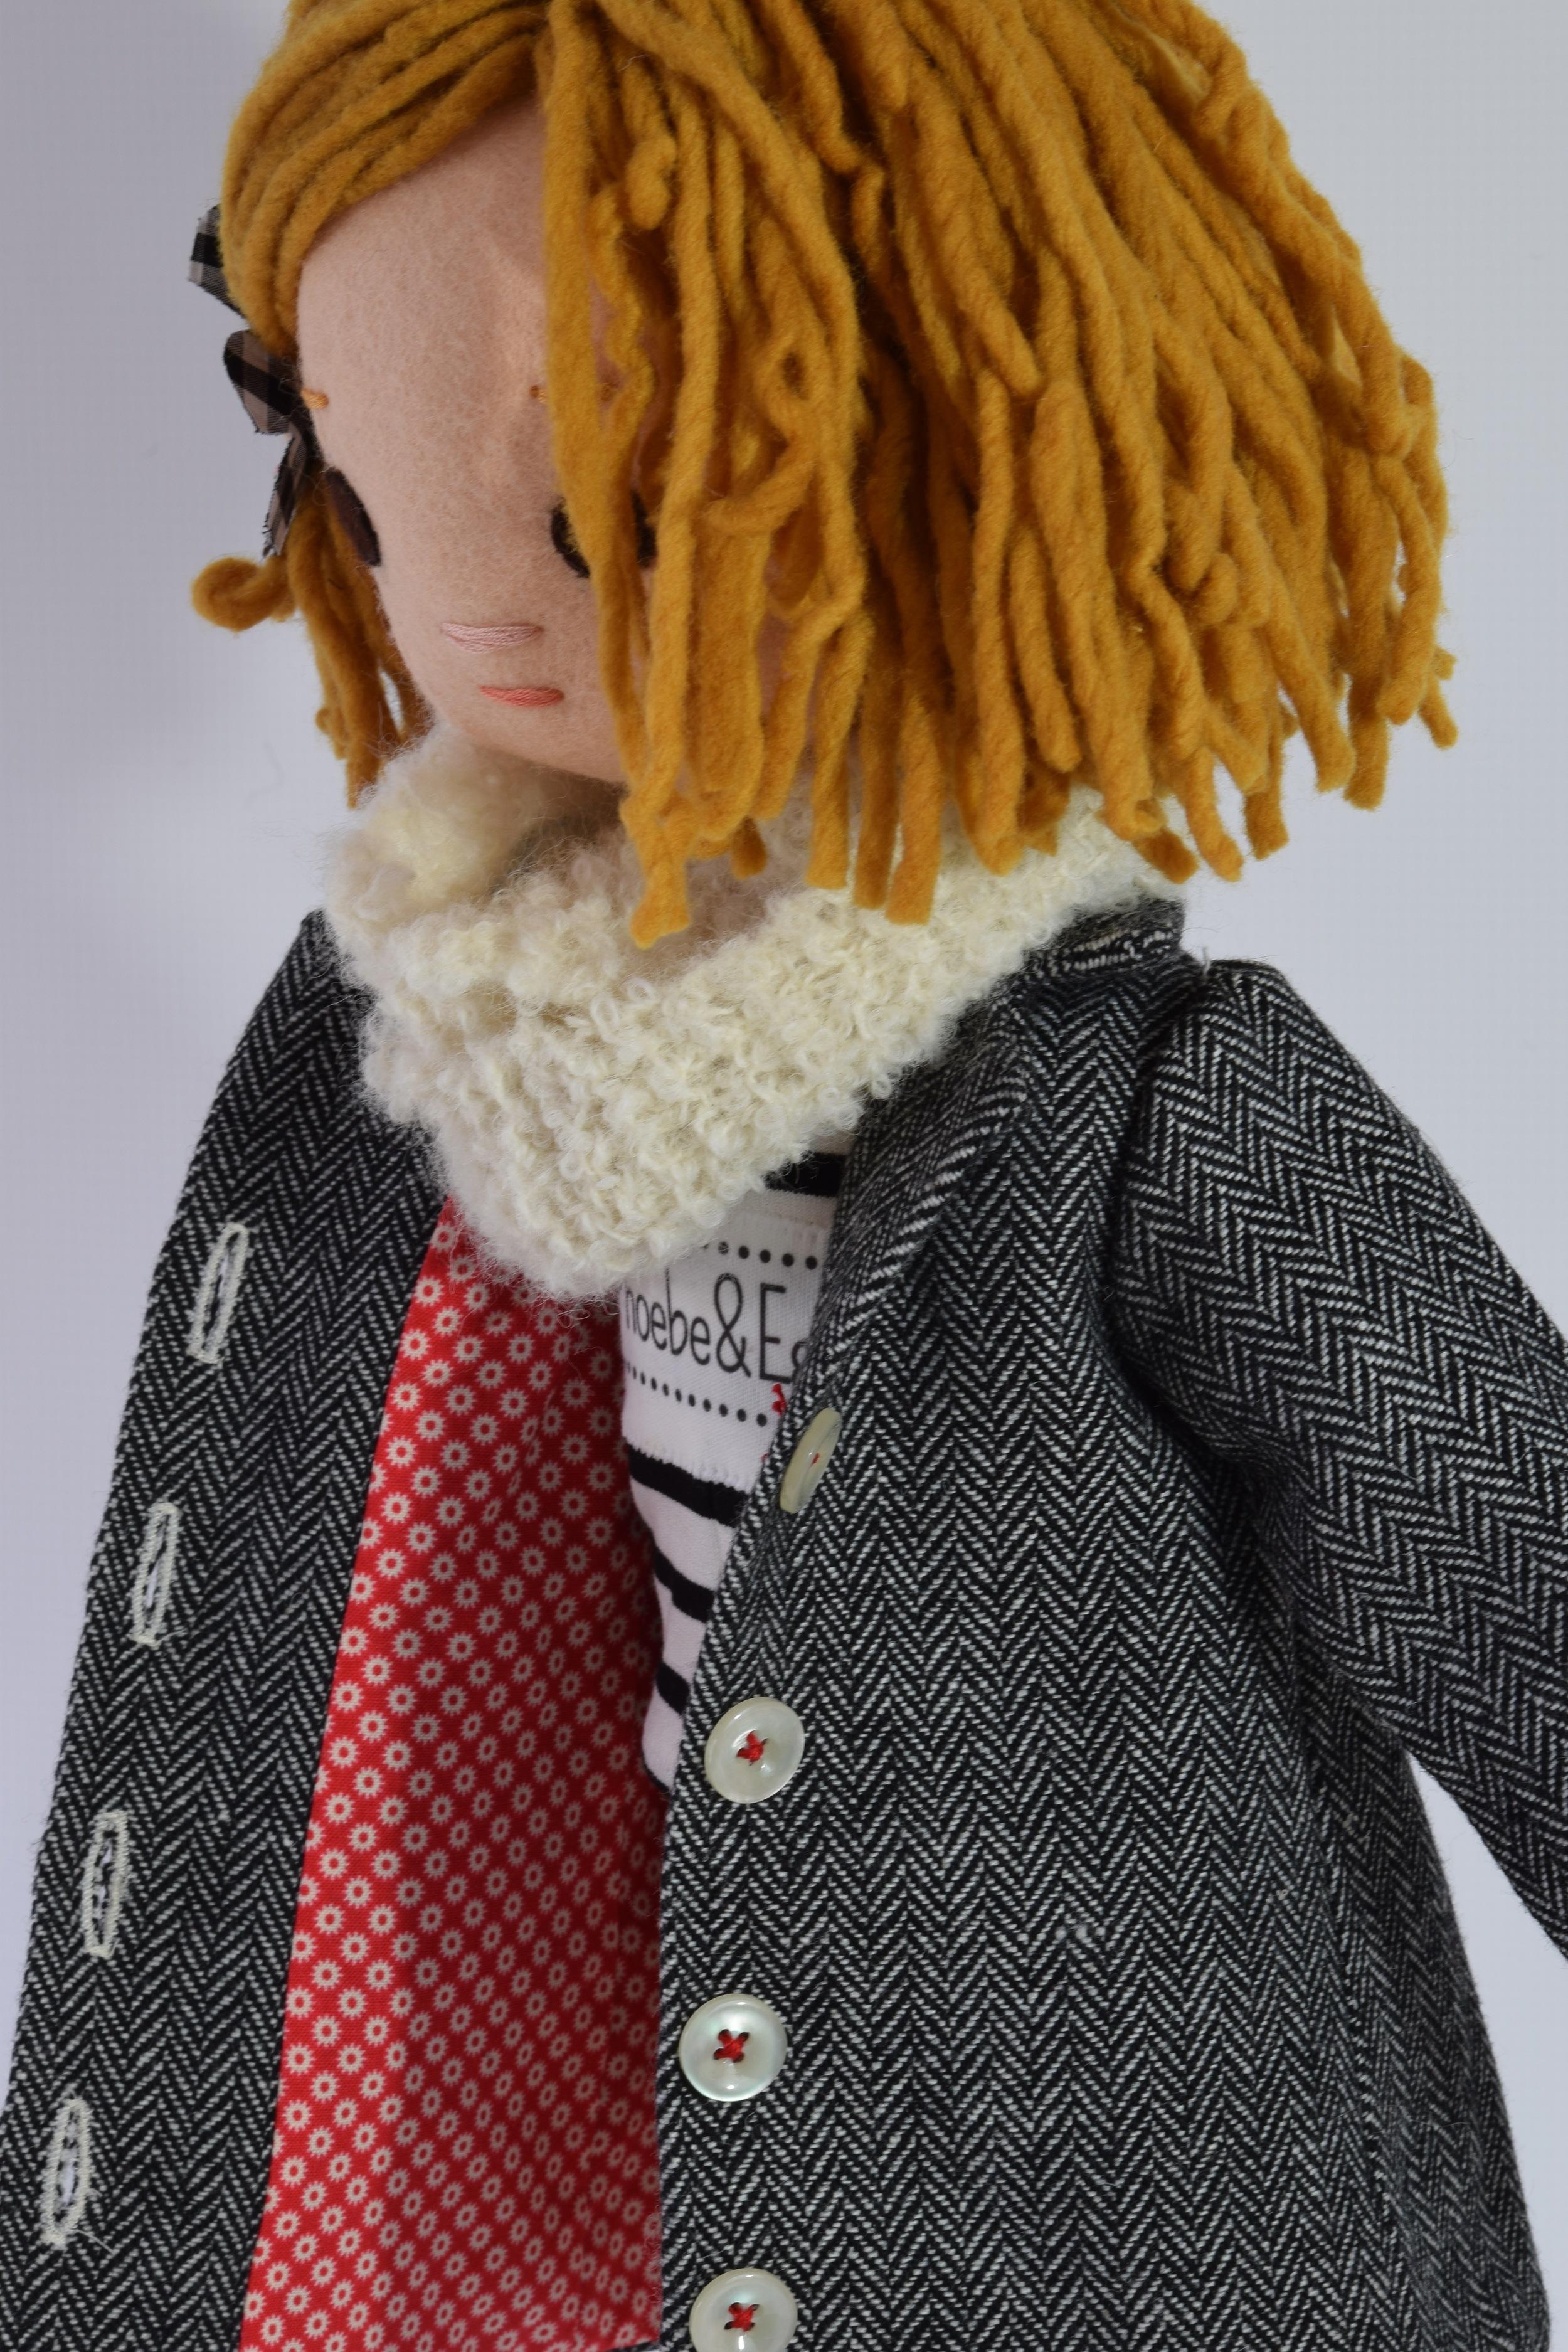 Winter set for Phoebe doll